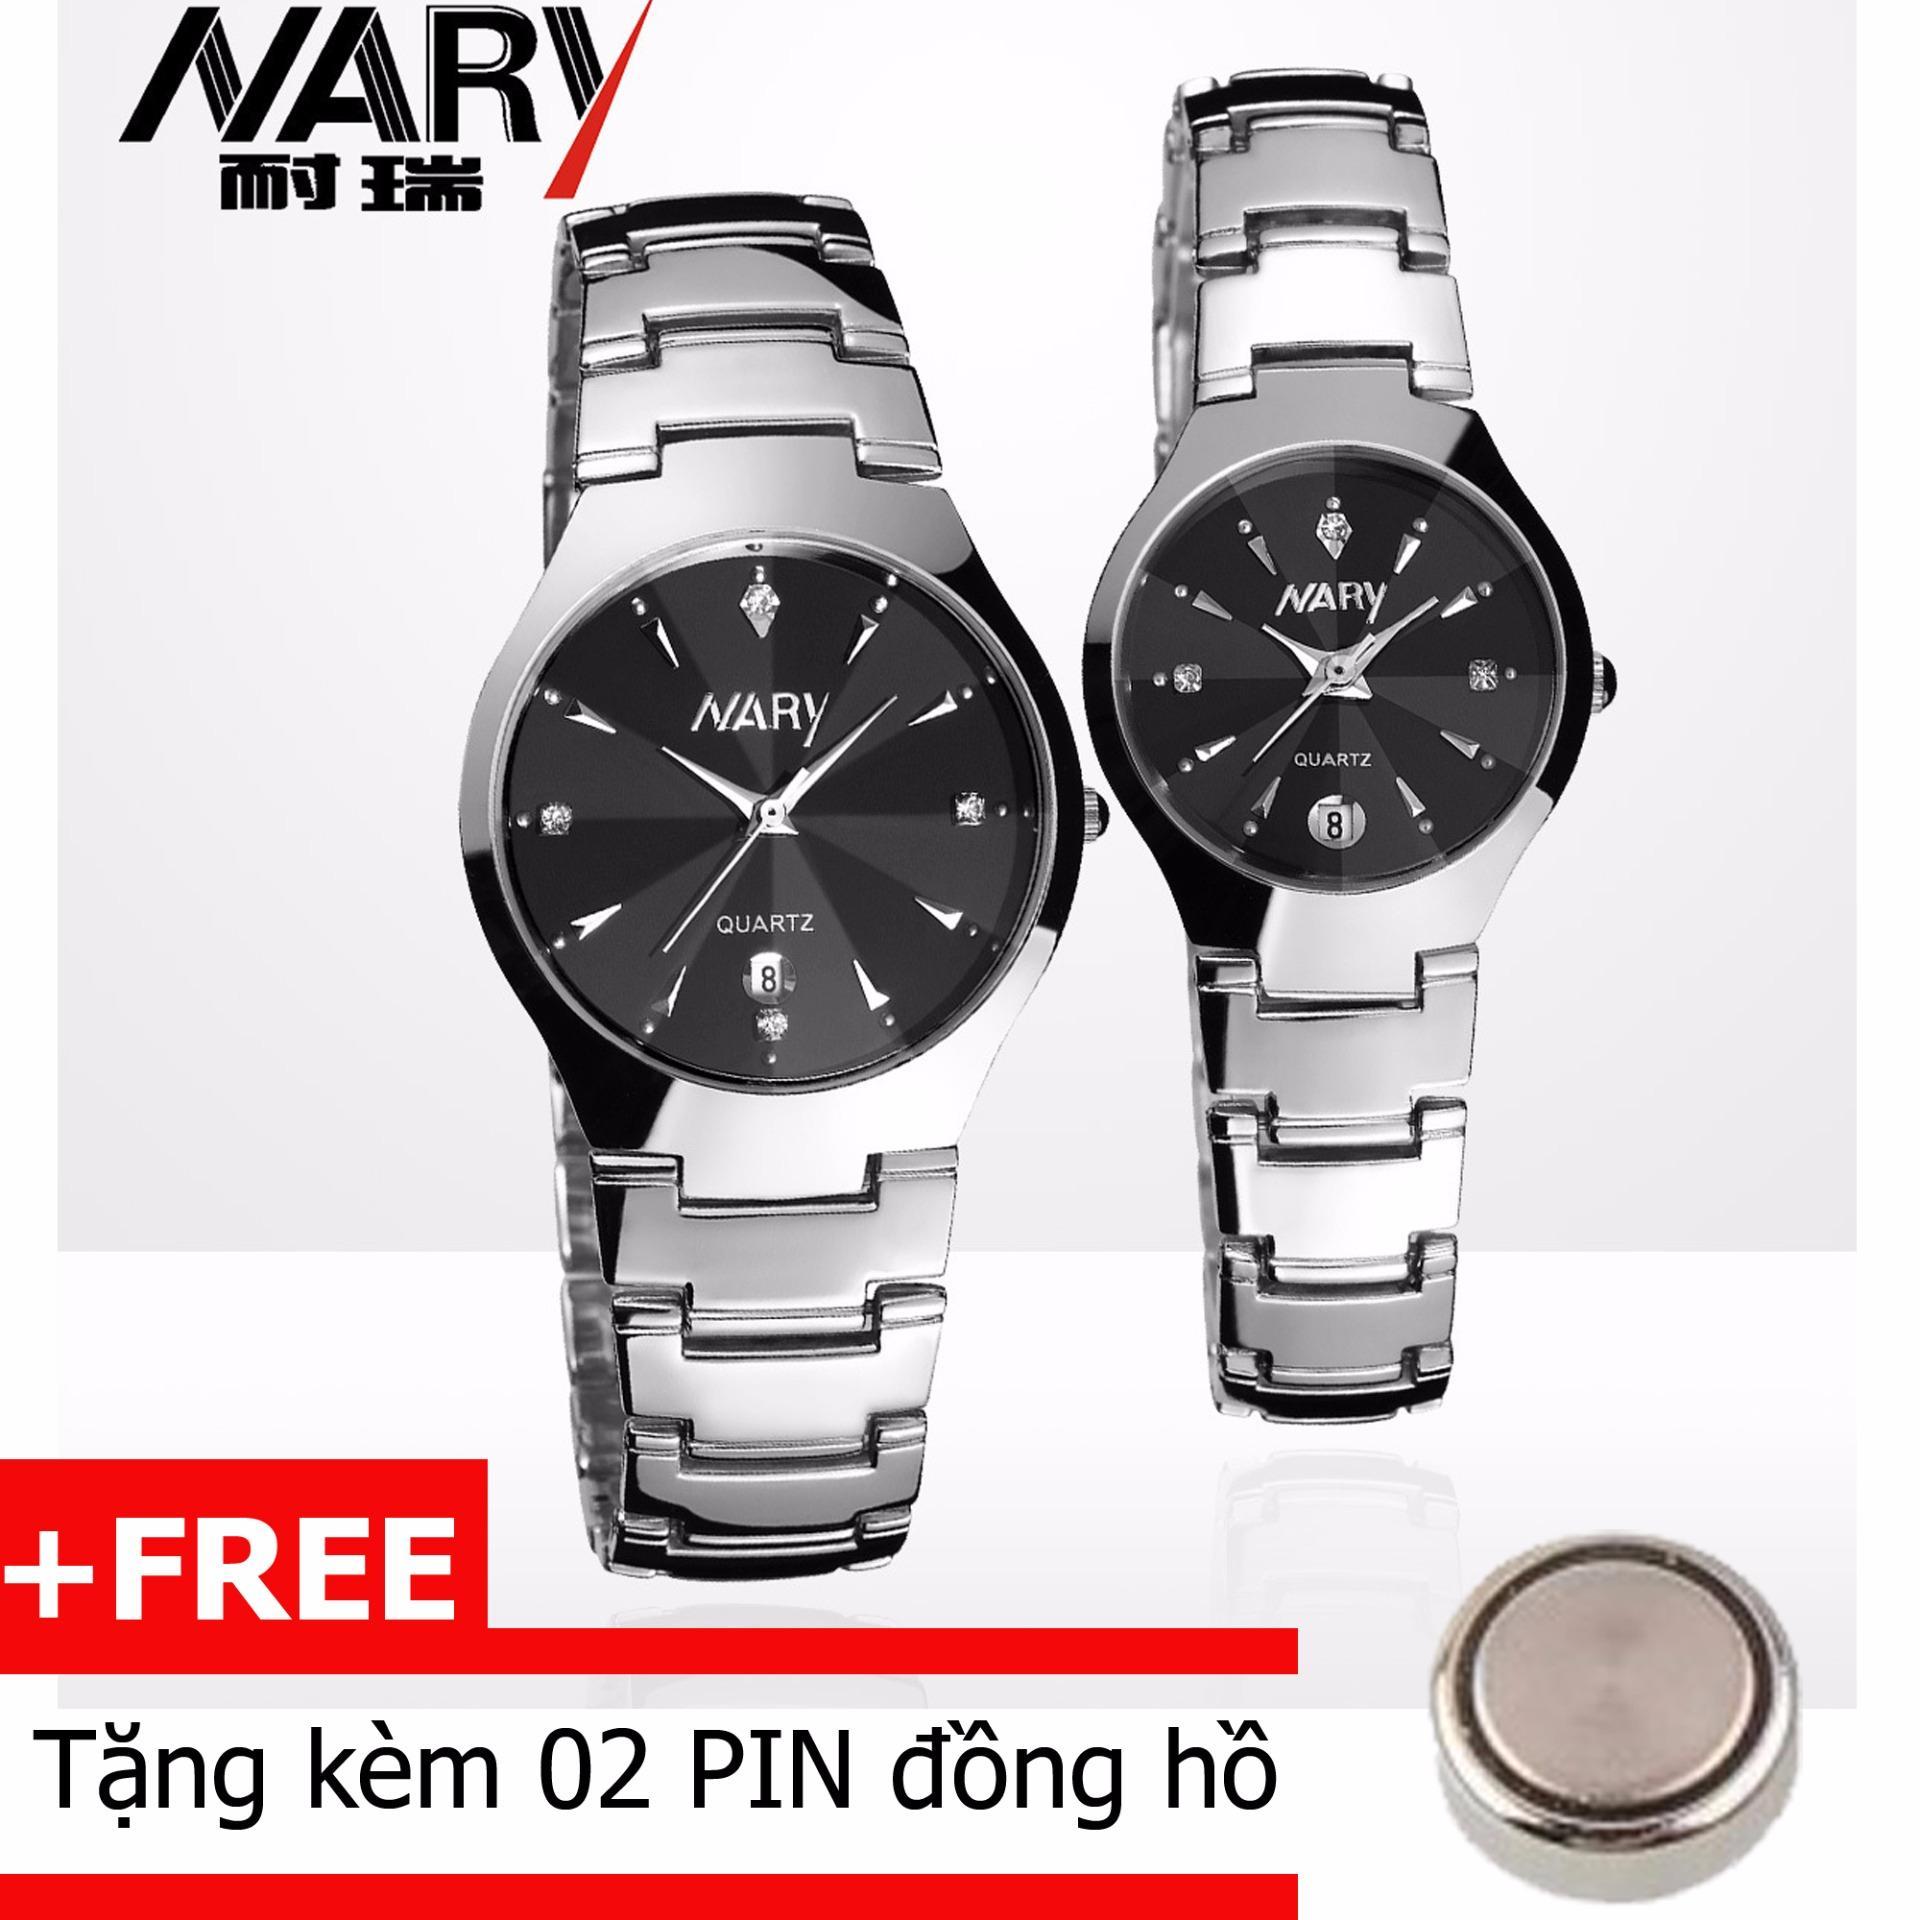 Giá Đồng hồ cặp dây hợp kim Nary 1004